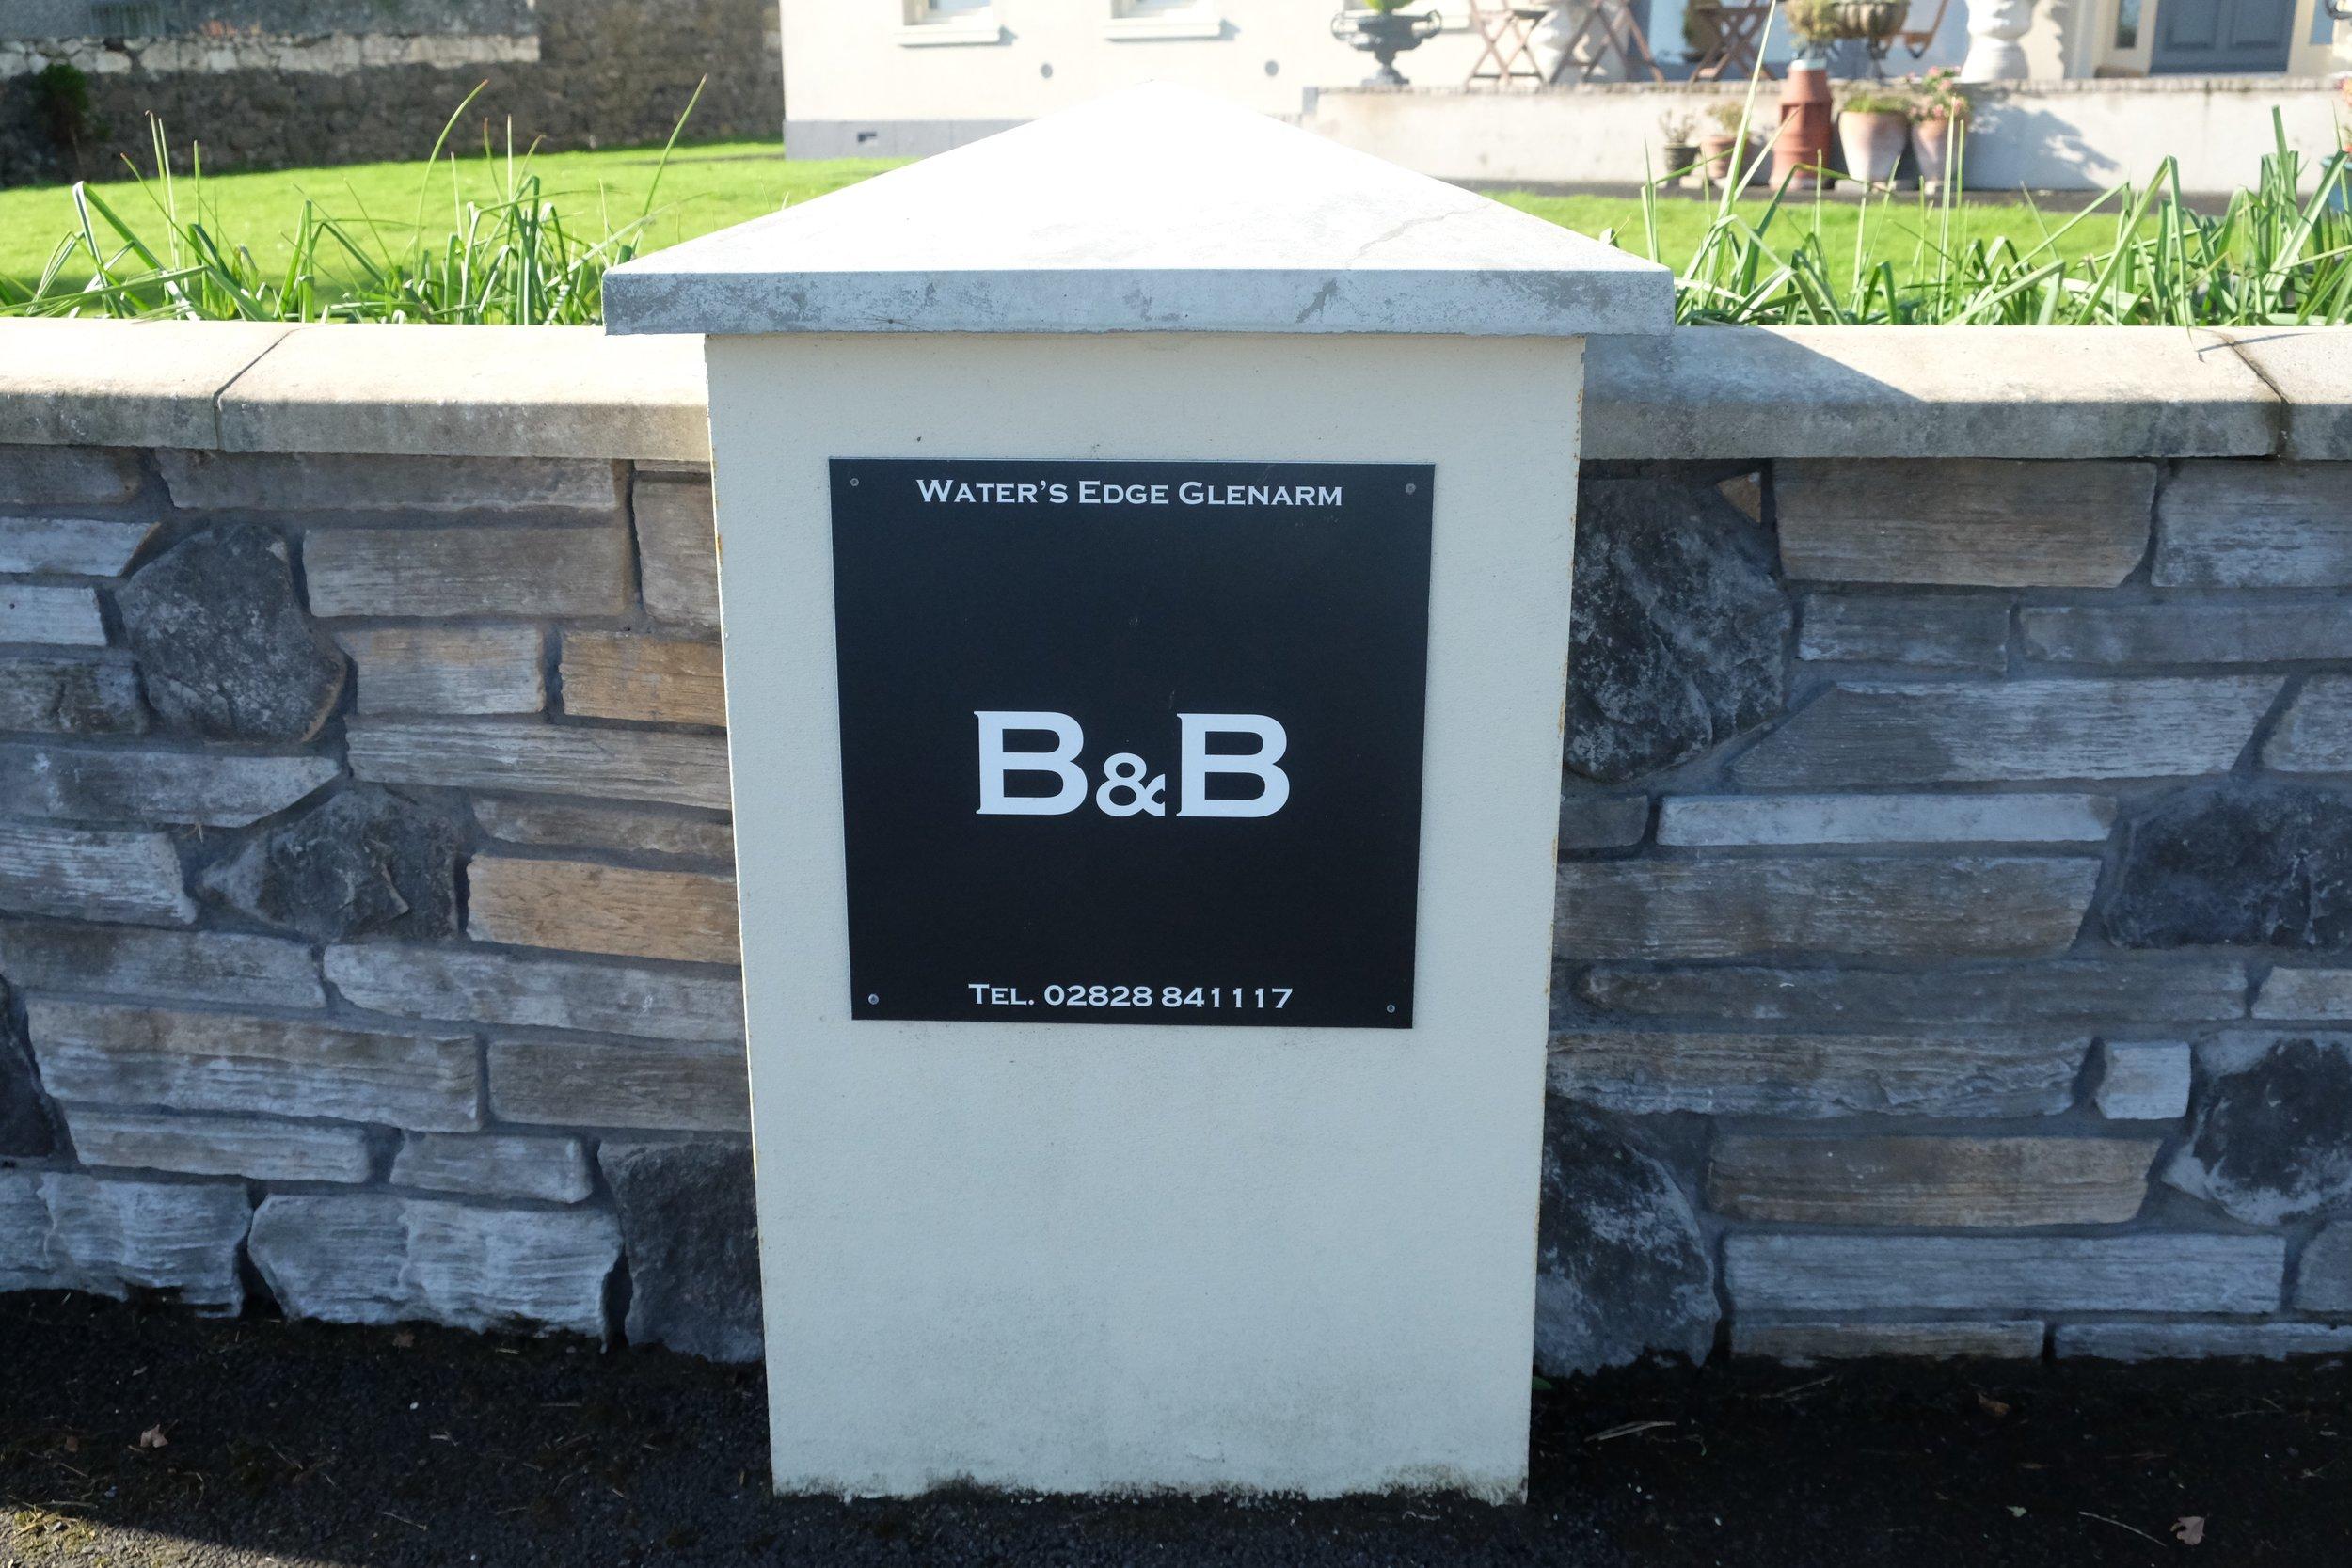 Water's Edge B&B, A2, Ballymena BT44, United Kingdom, +44 28 2884 1117.